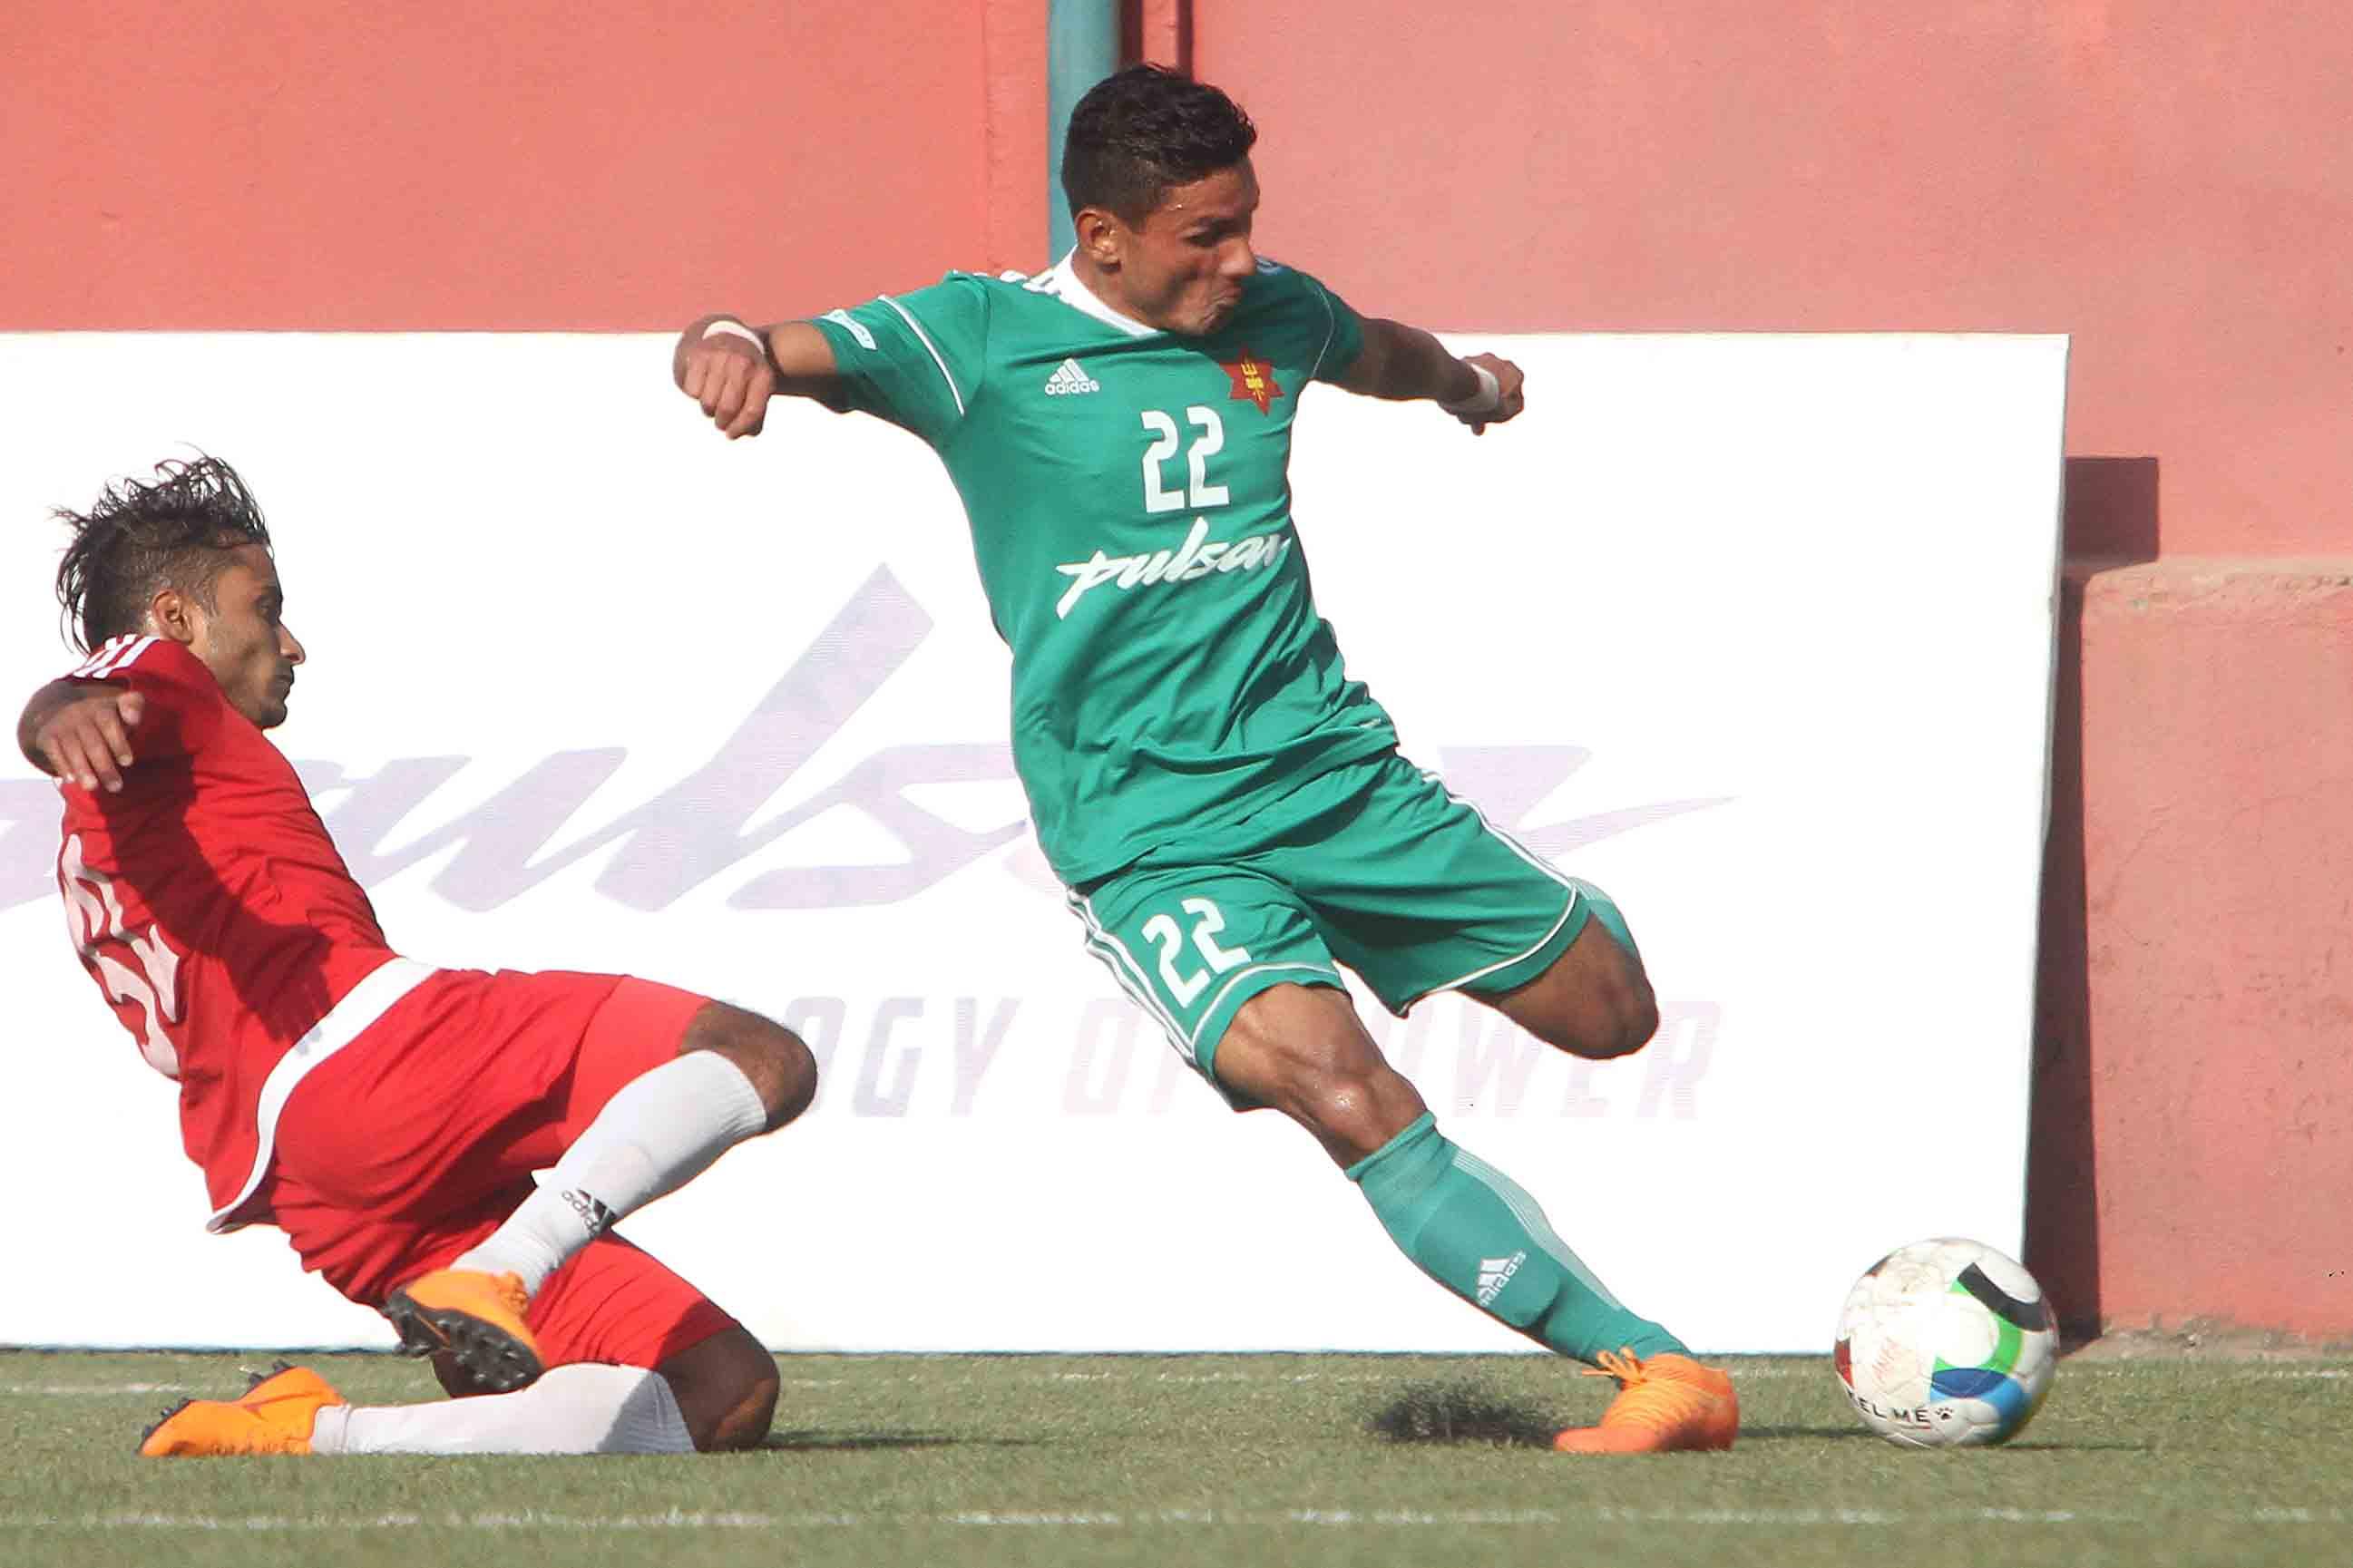 Tek Bahadur Budhathoki of TAC shoots the ball under pressure from Ajit Bhandari of NPC during their Pulsar Martyrs Memorial A Division League match in Lalitpur on Friday. Photo: THT